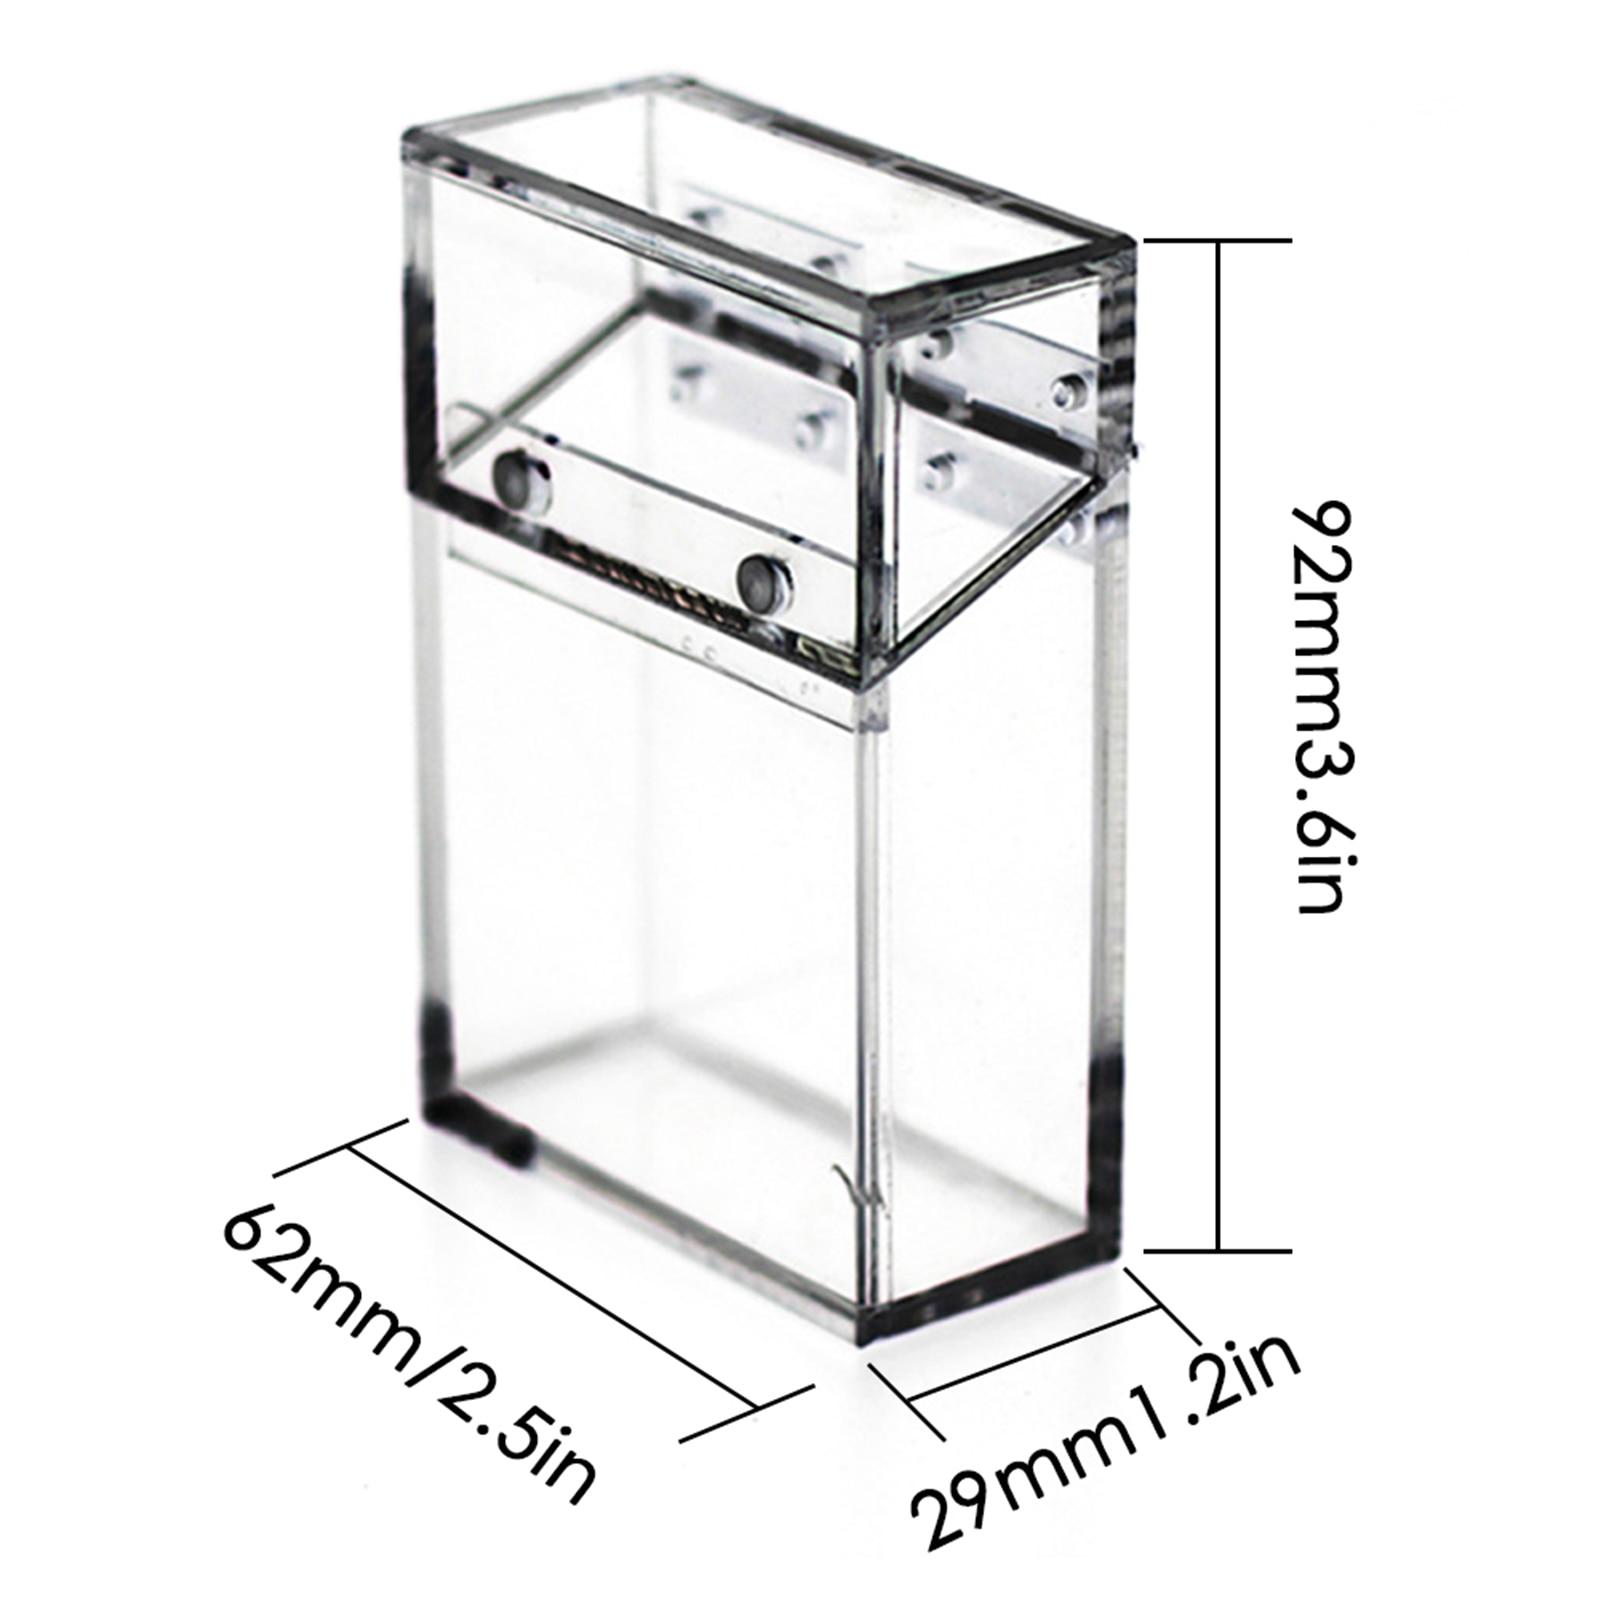 Acrylic Transparent Box Thickened Portable Storage Box Acrylic Cigarette Holder Lighter Storage Organizer Case Carry Box New